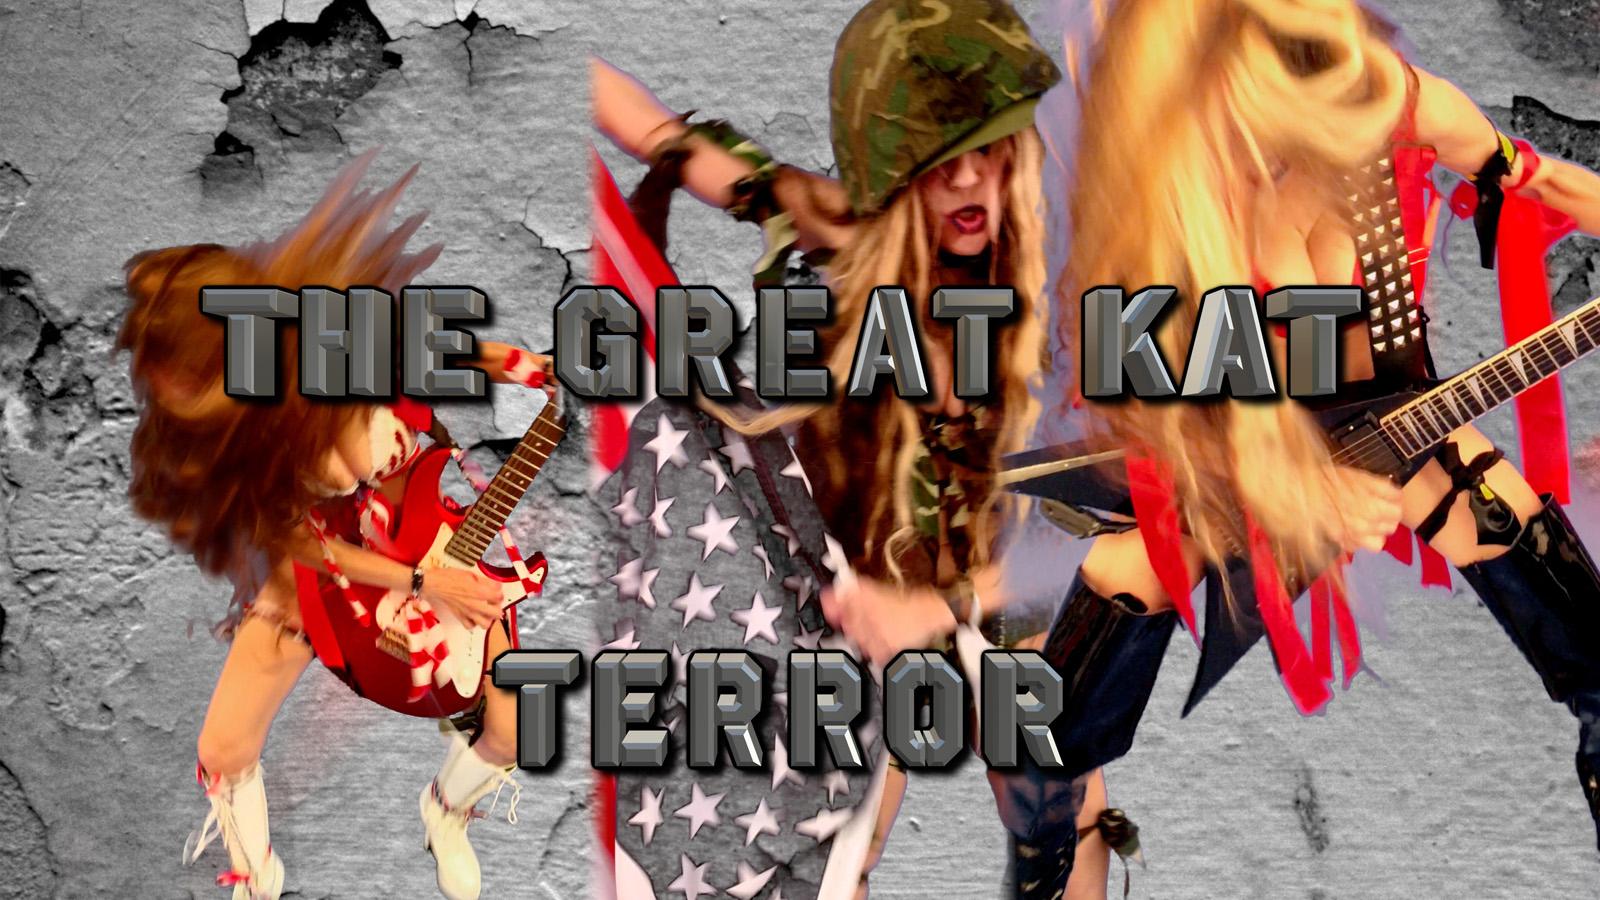 THE GREAT KAT TERROR MUSIC VIDEO!